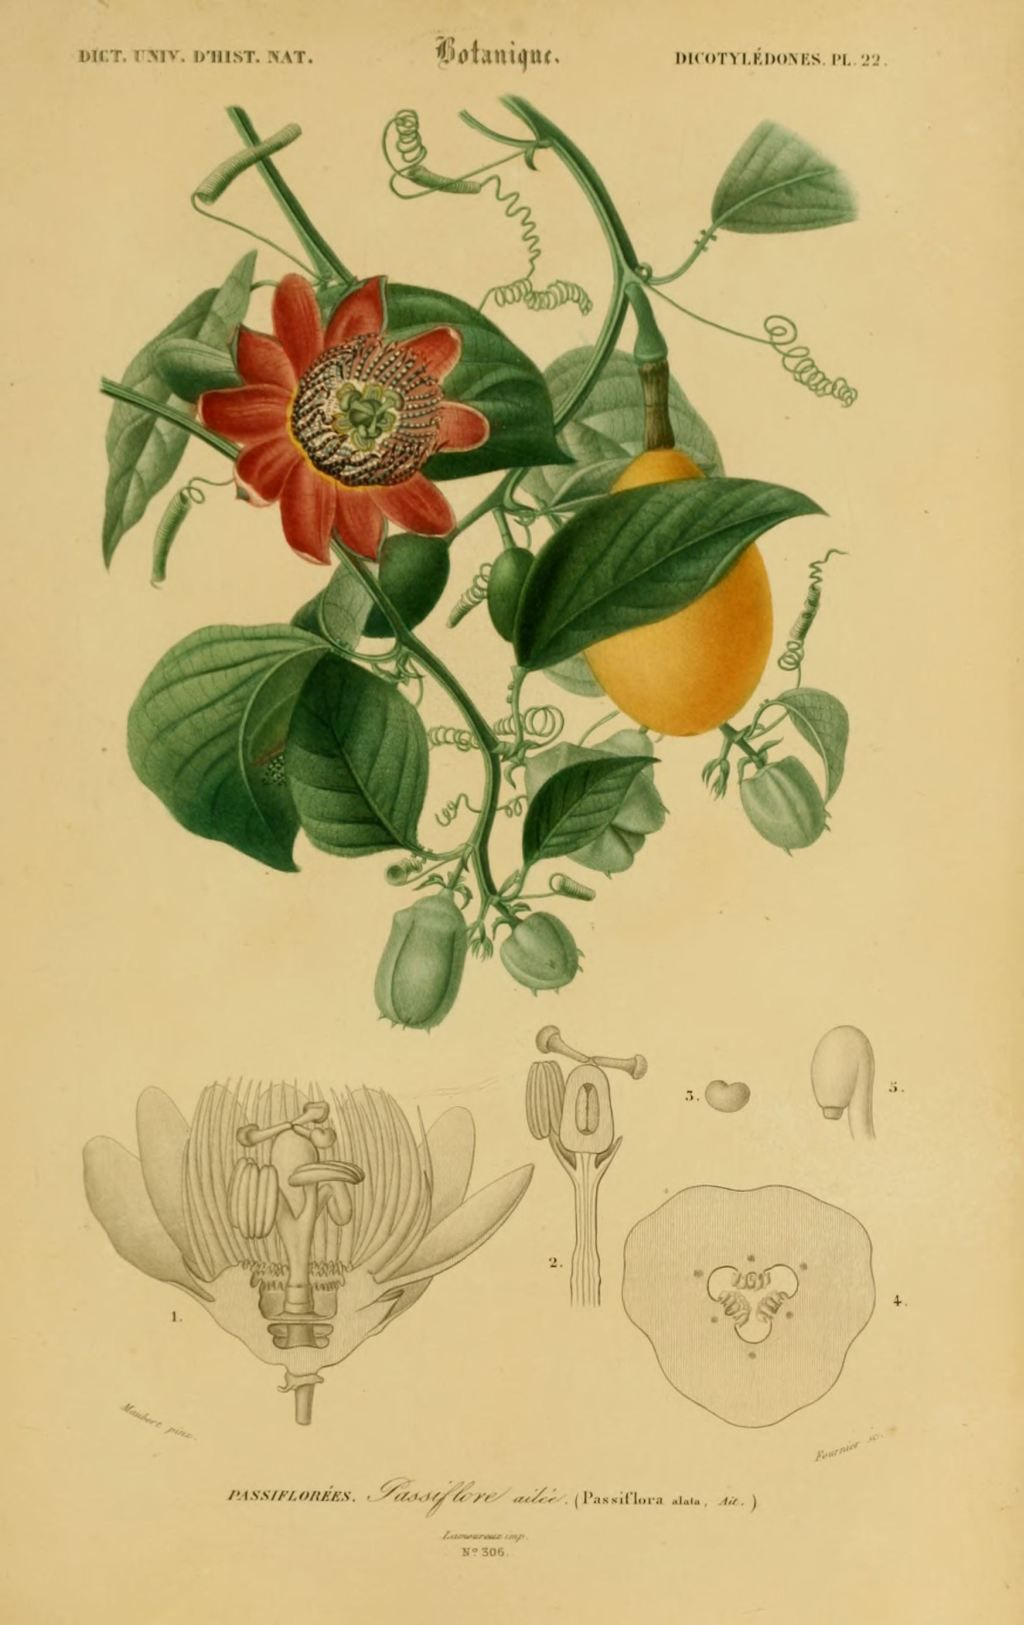 pingl par gaelle jean sur botanique pinterest illustration botanique botanique et dessin. Black Bedroom Furniture Sets. Home Design Ideas